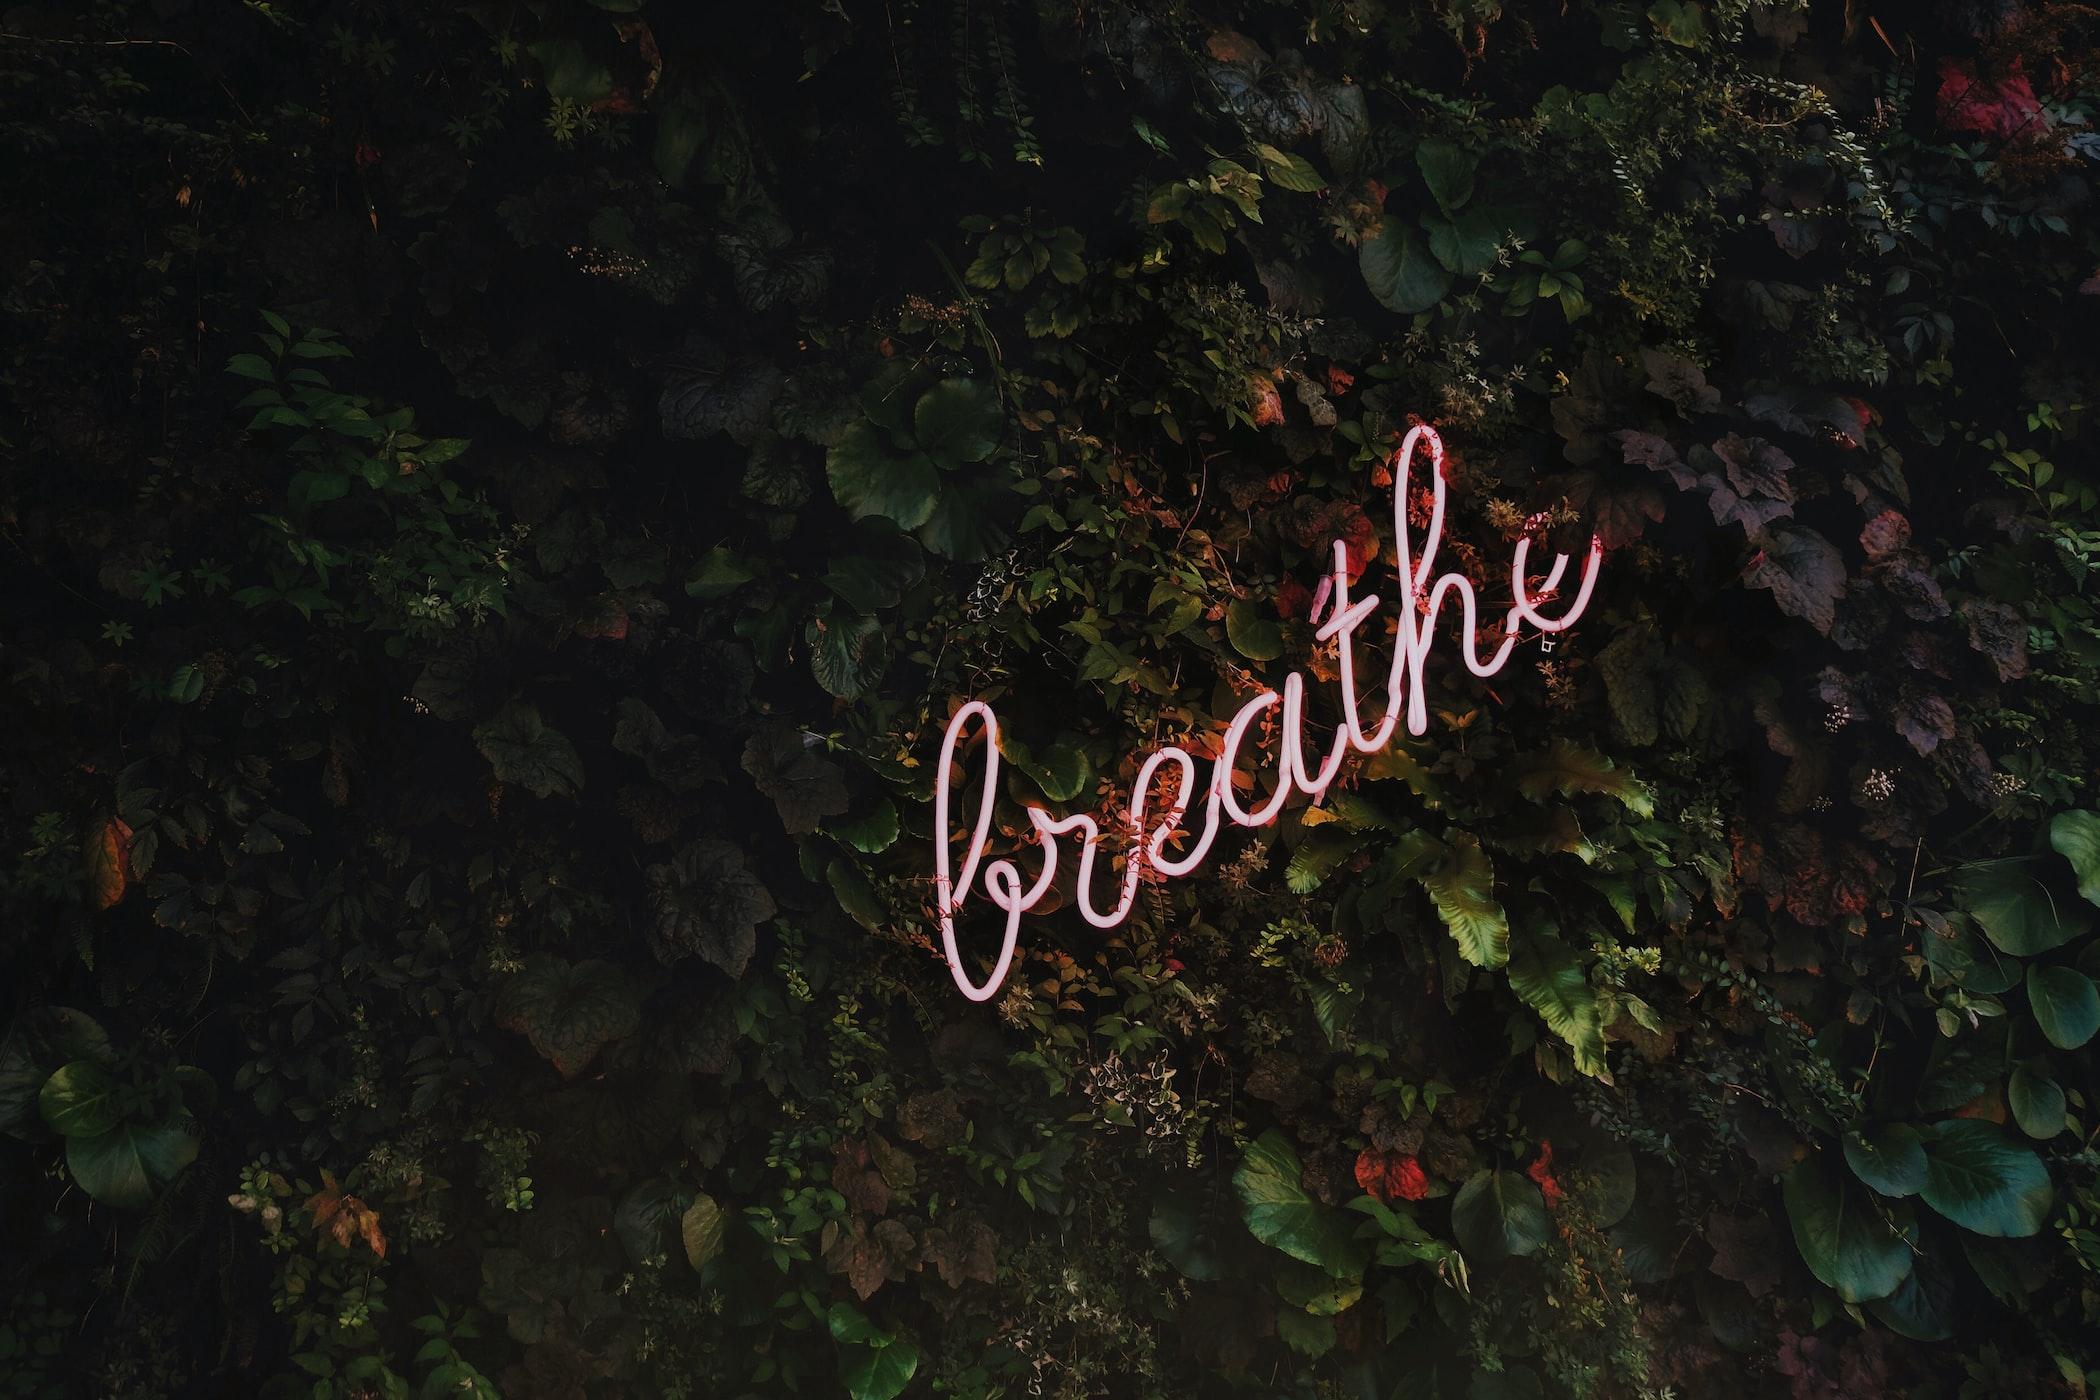 Breathe neon signage